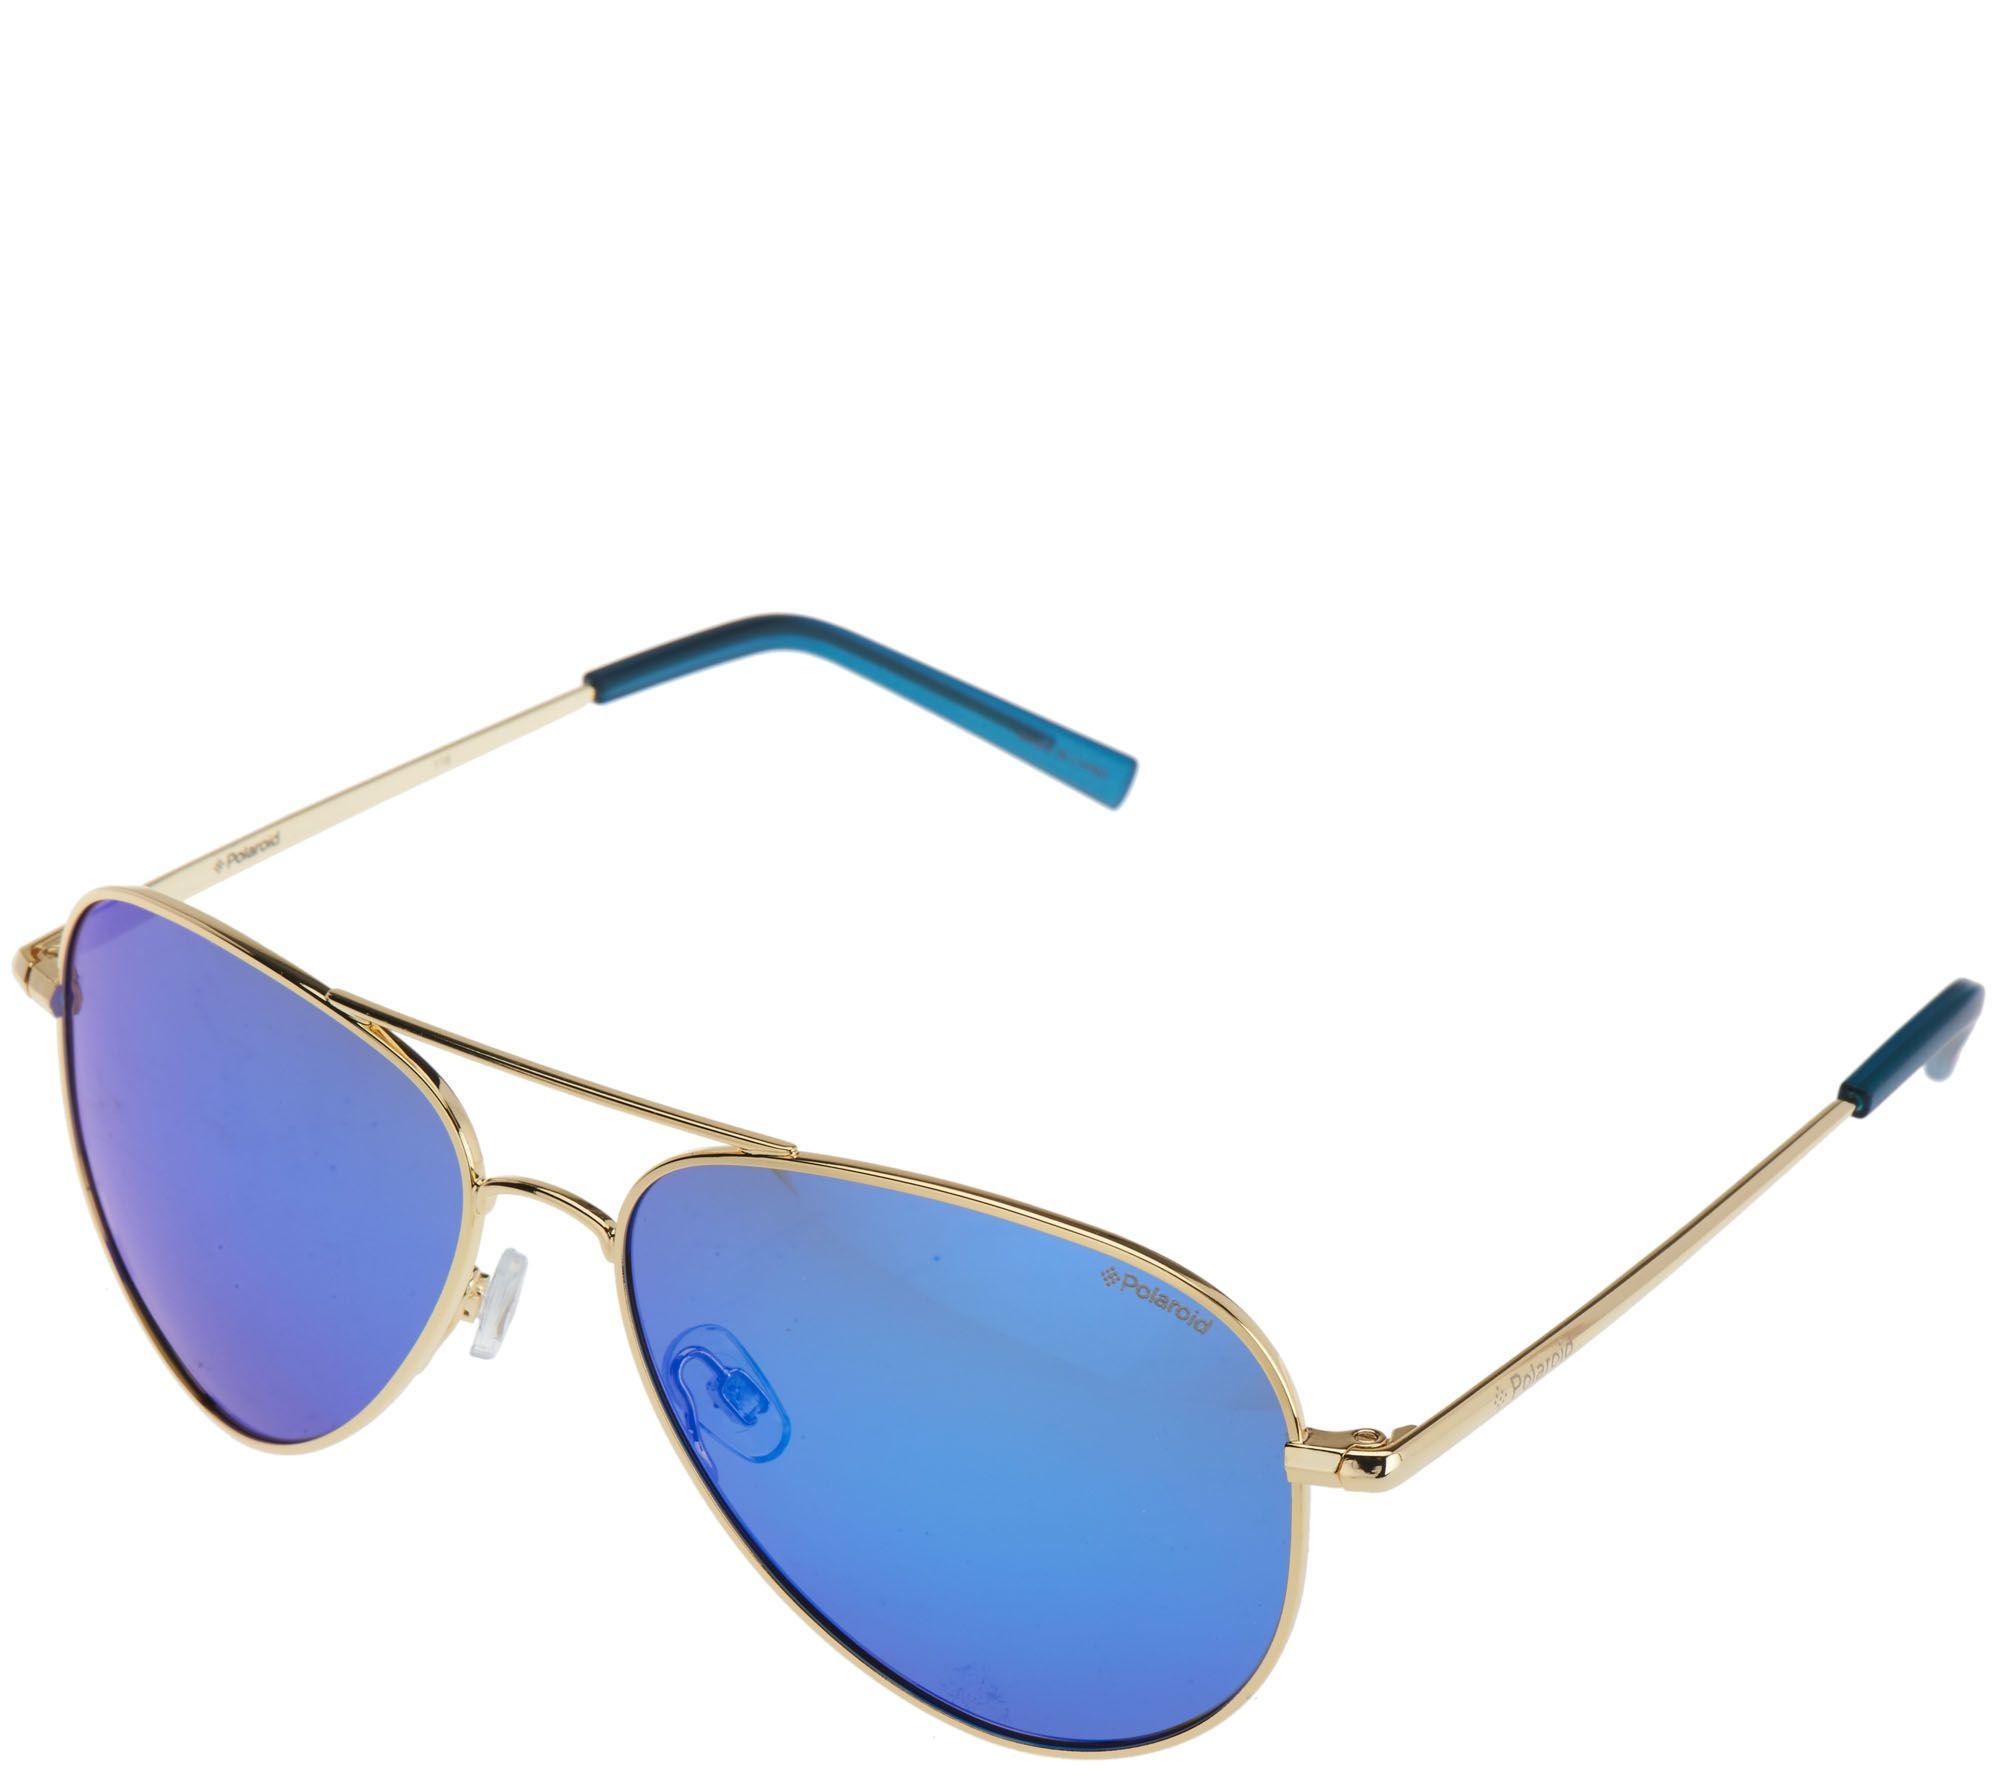 7a66806bff11 Polaroid Aviator Polarized Sunglasses with Case   Kit - Page 1 — QVC.com